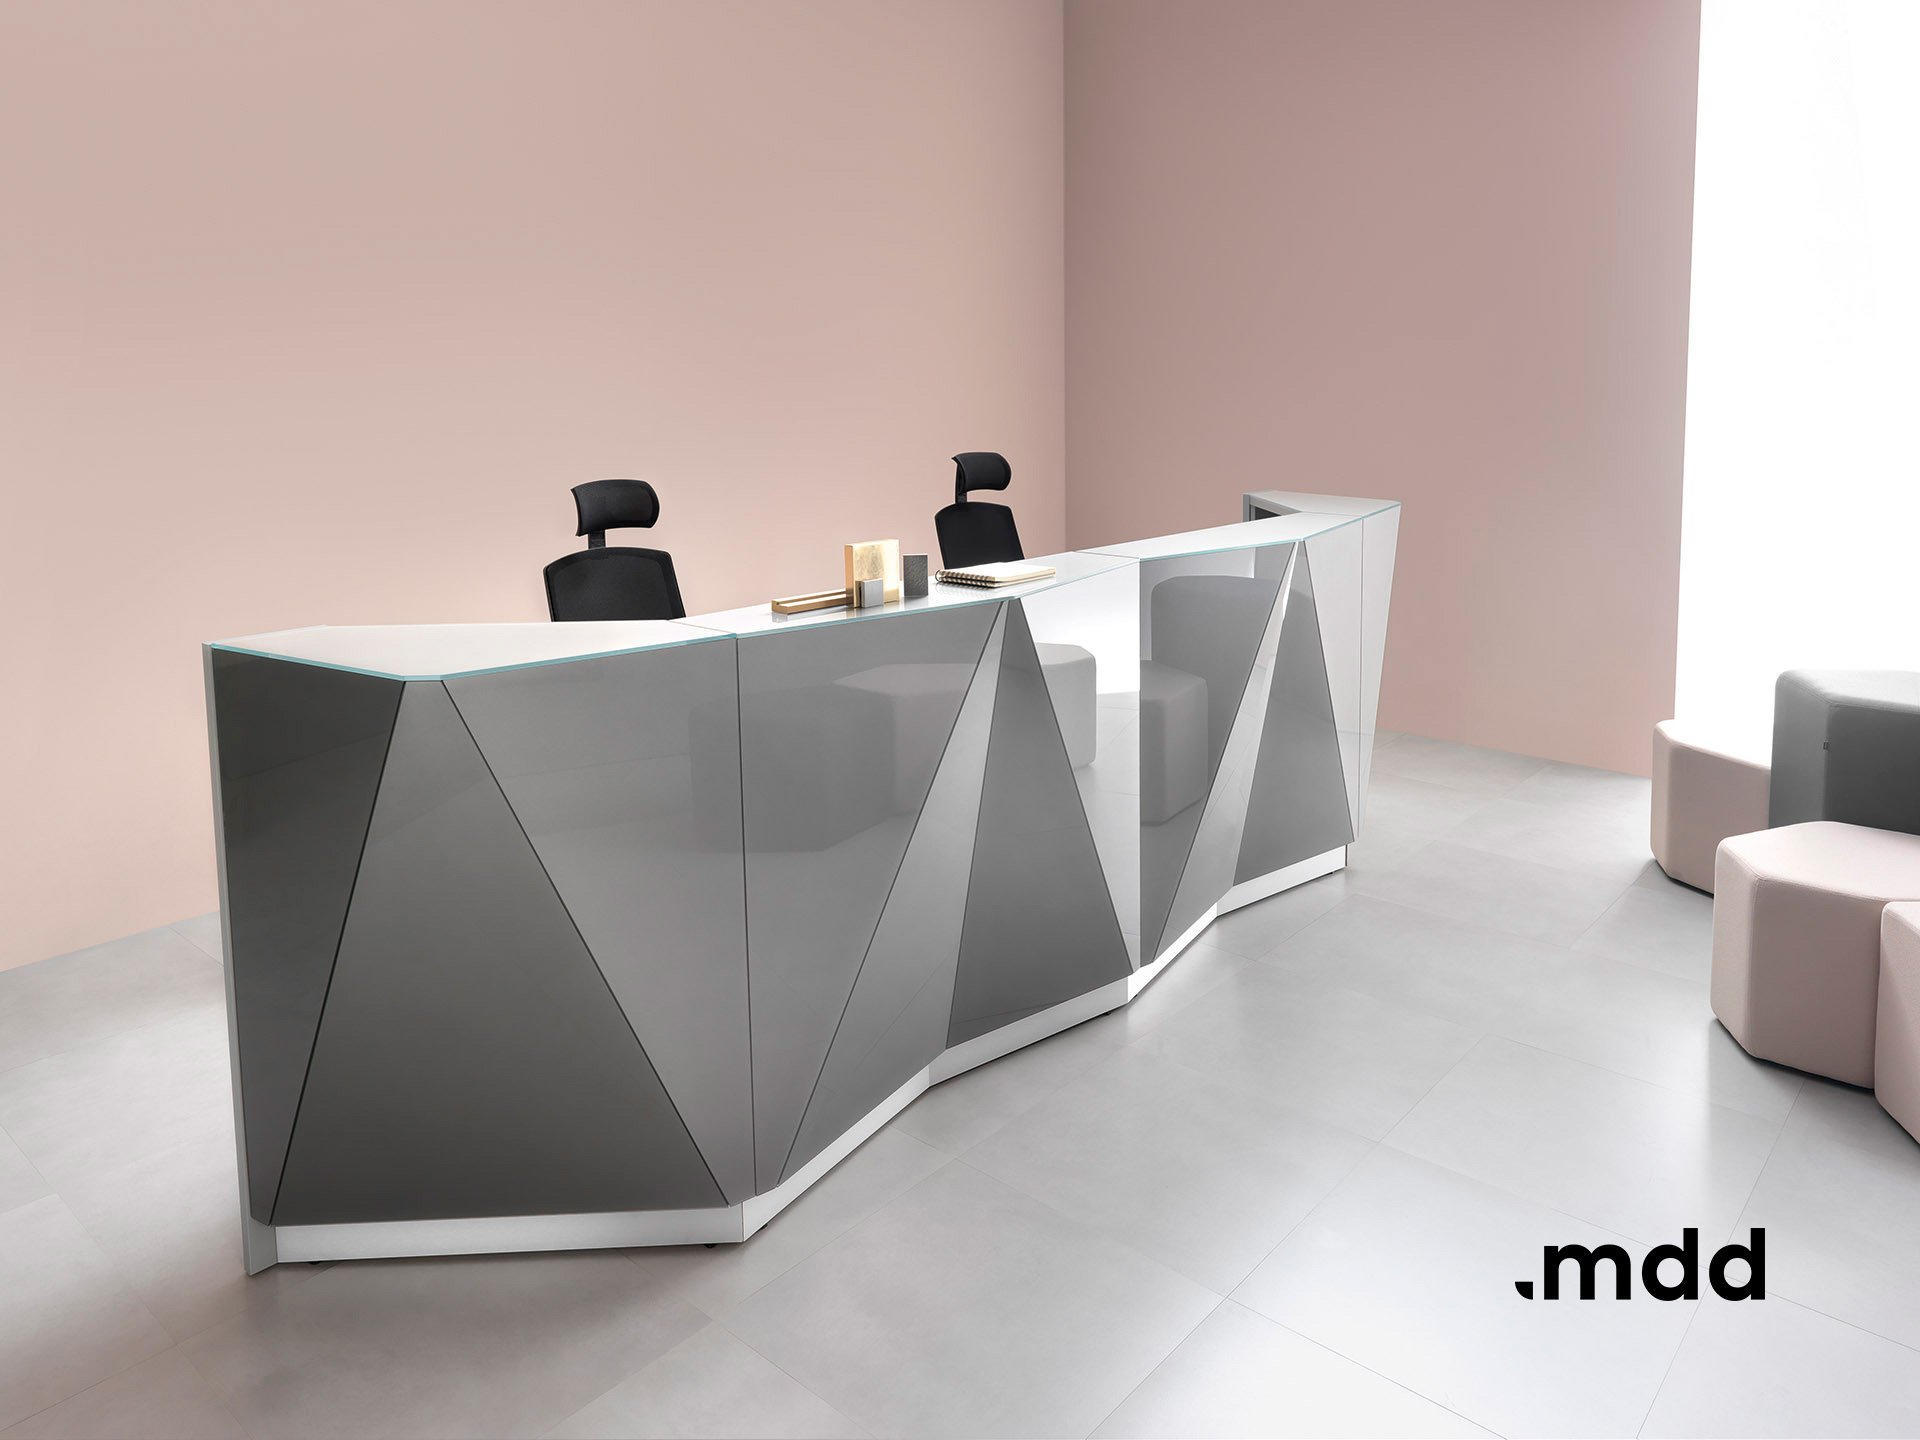 Lada recepcyjna Alpa - Producent: MDD, Dystrybutor: Vipservice